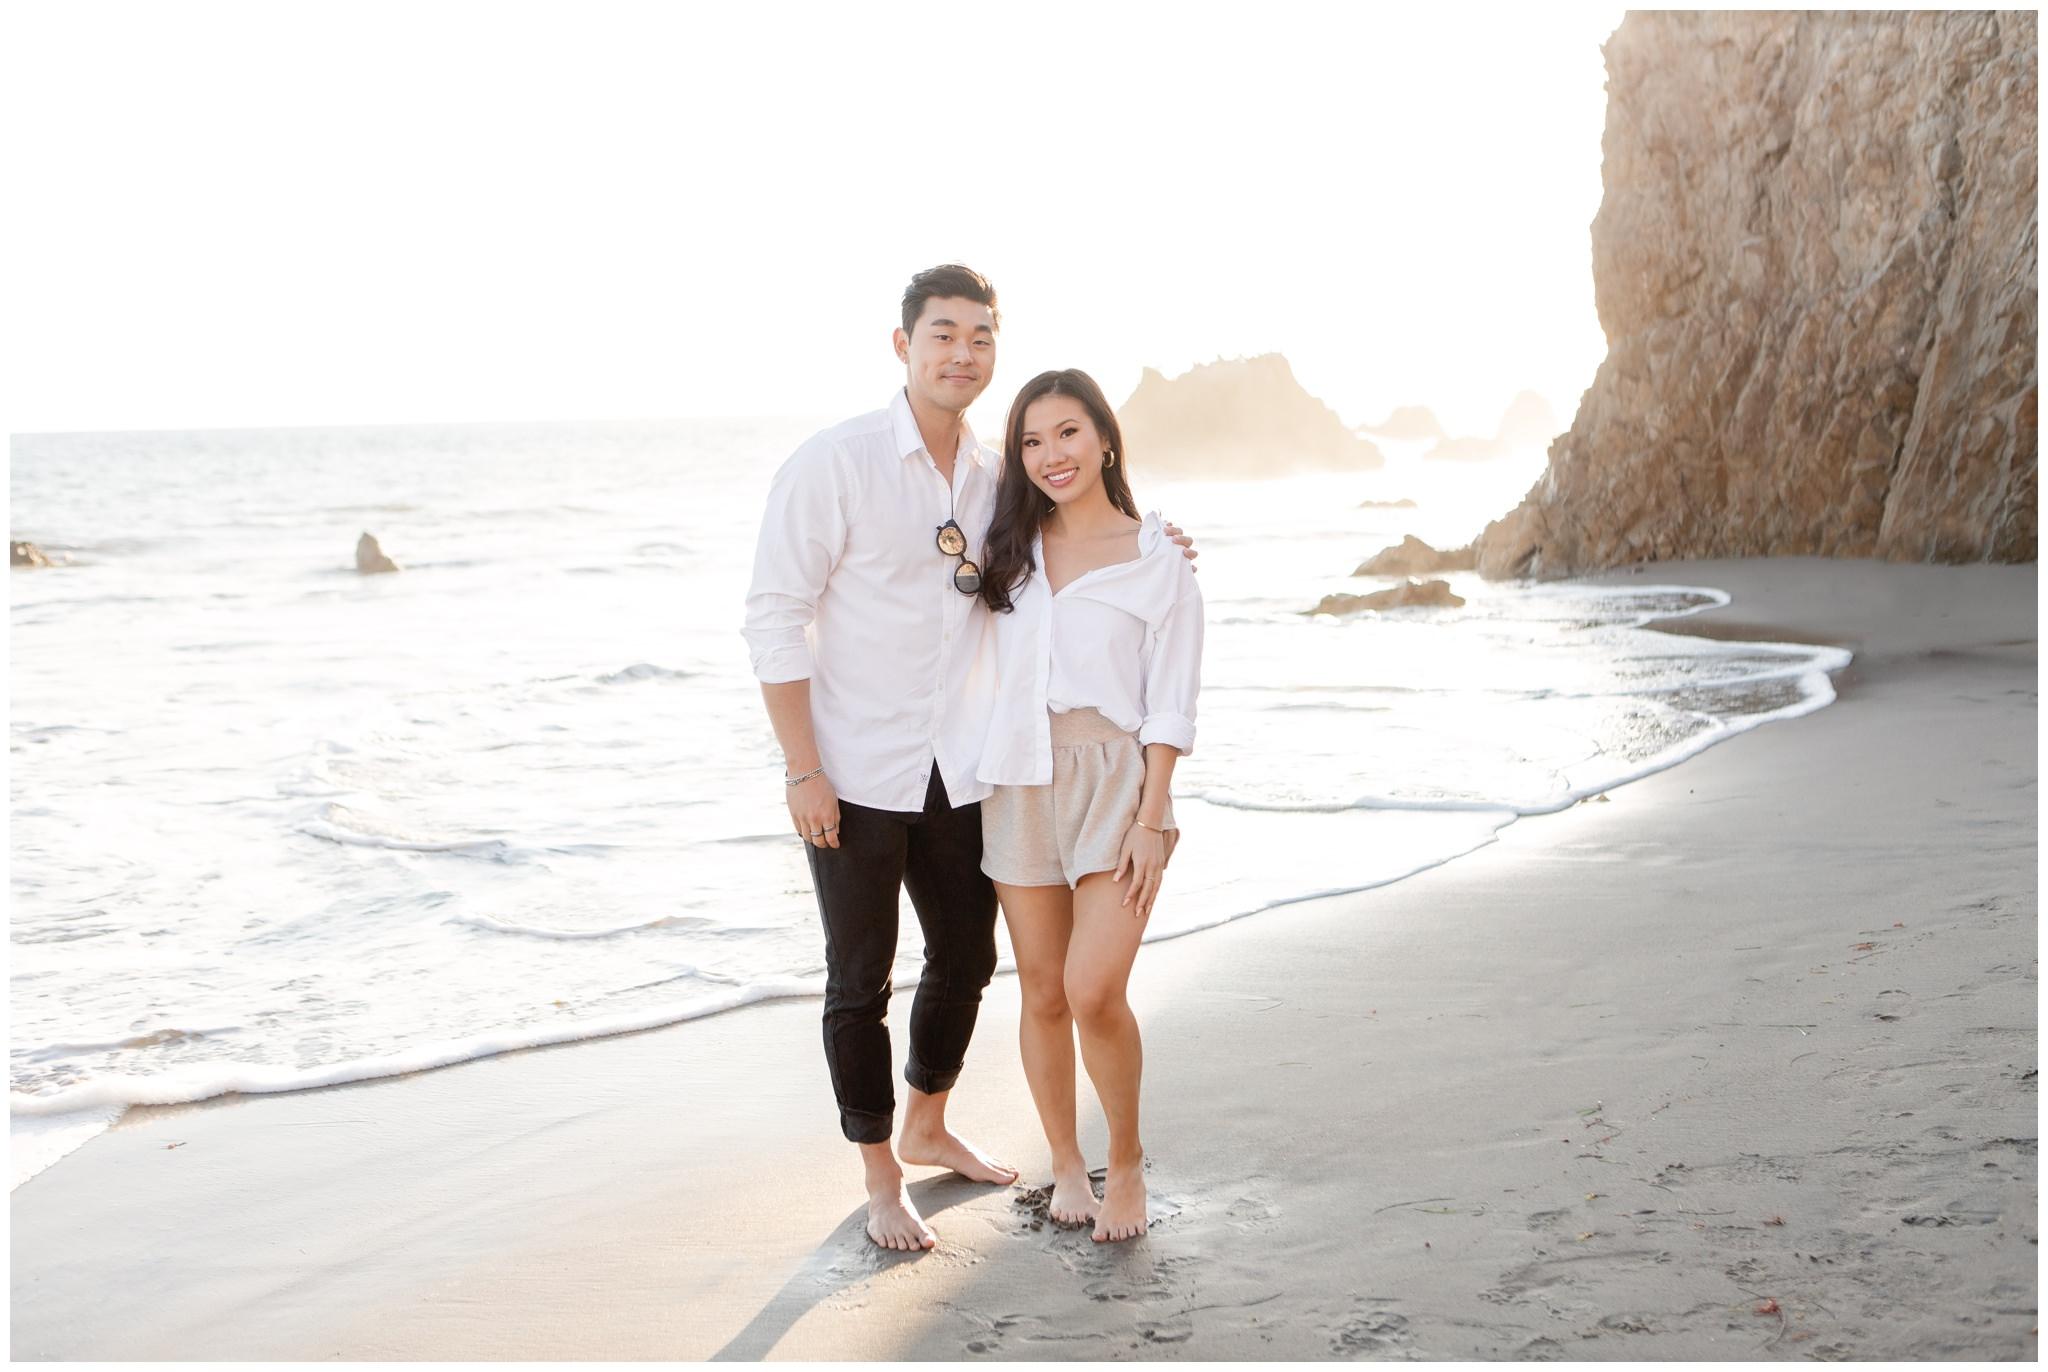 California engagement session on Malibu beach.